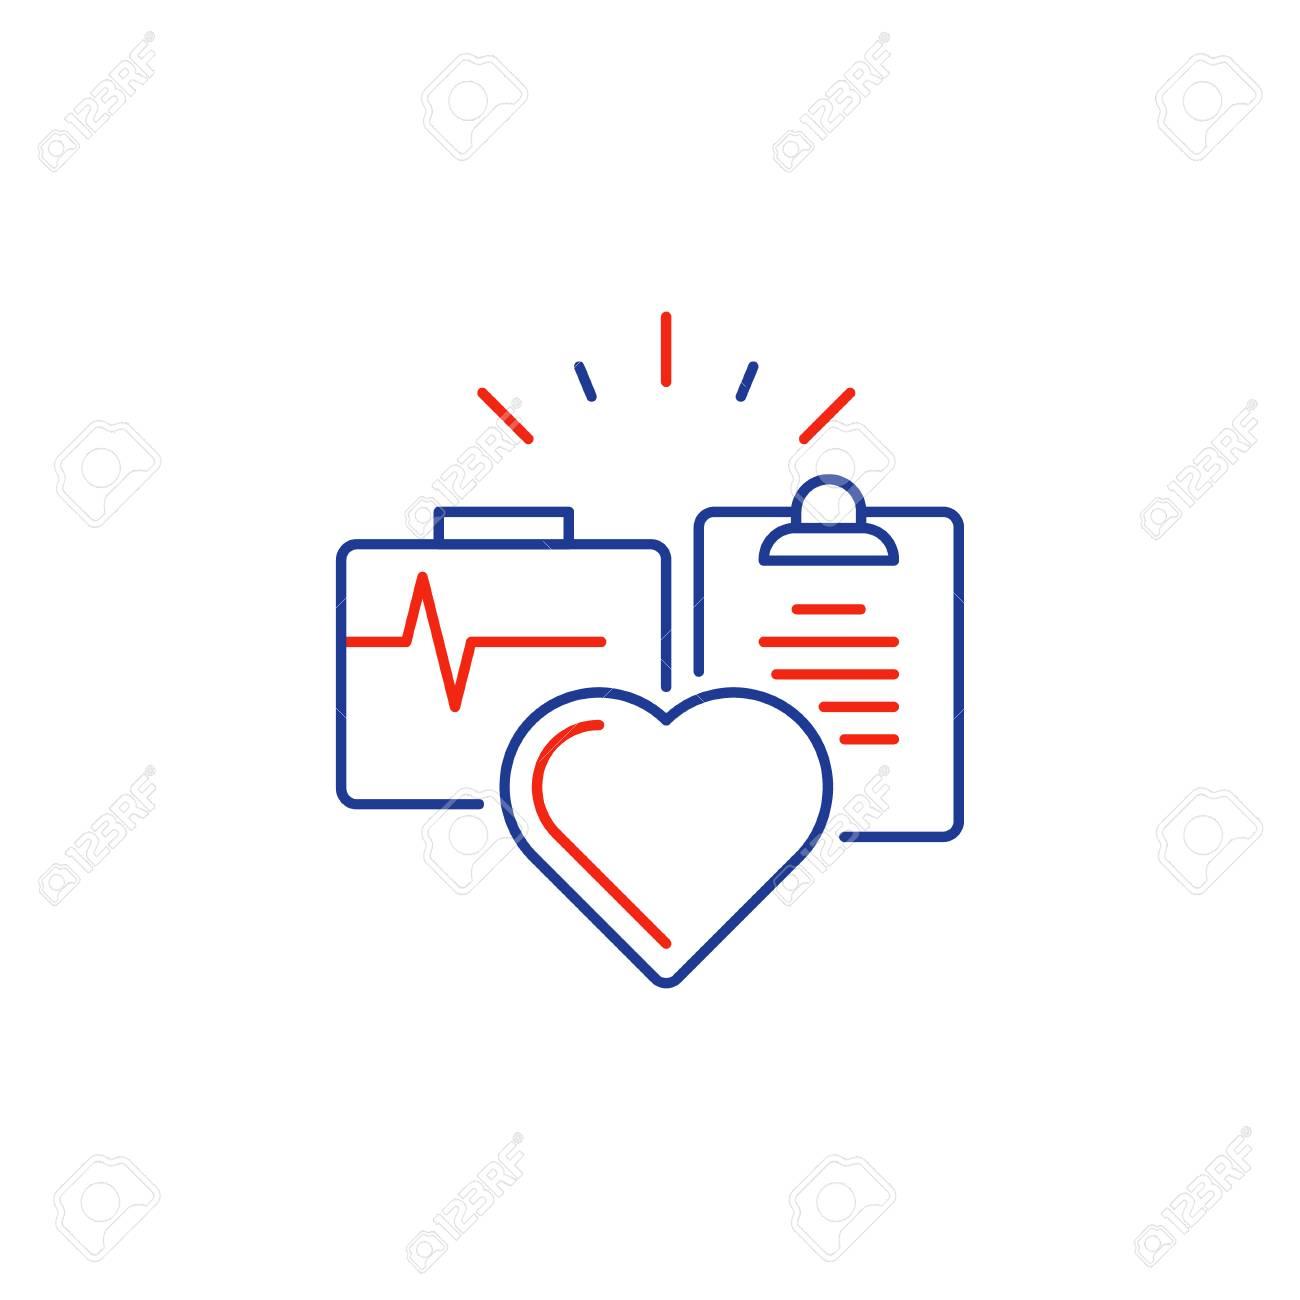 Cardiovascular disease prevention program, heart diagnostic,